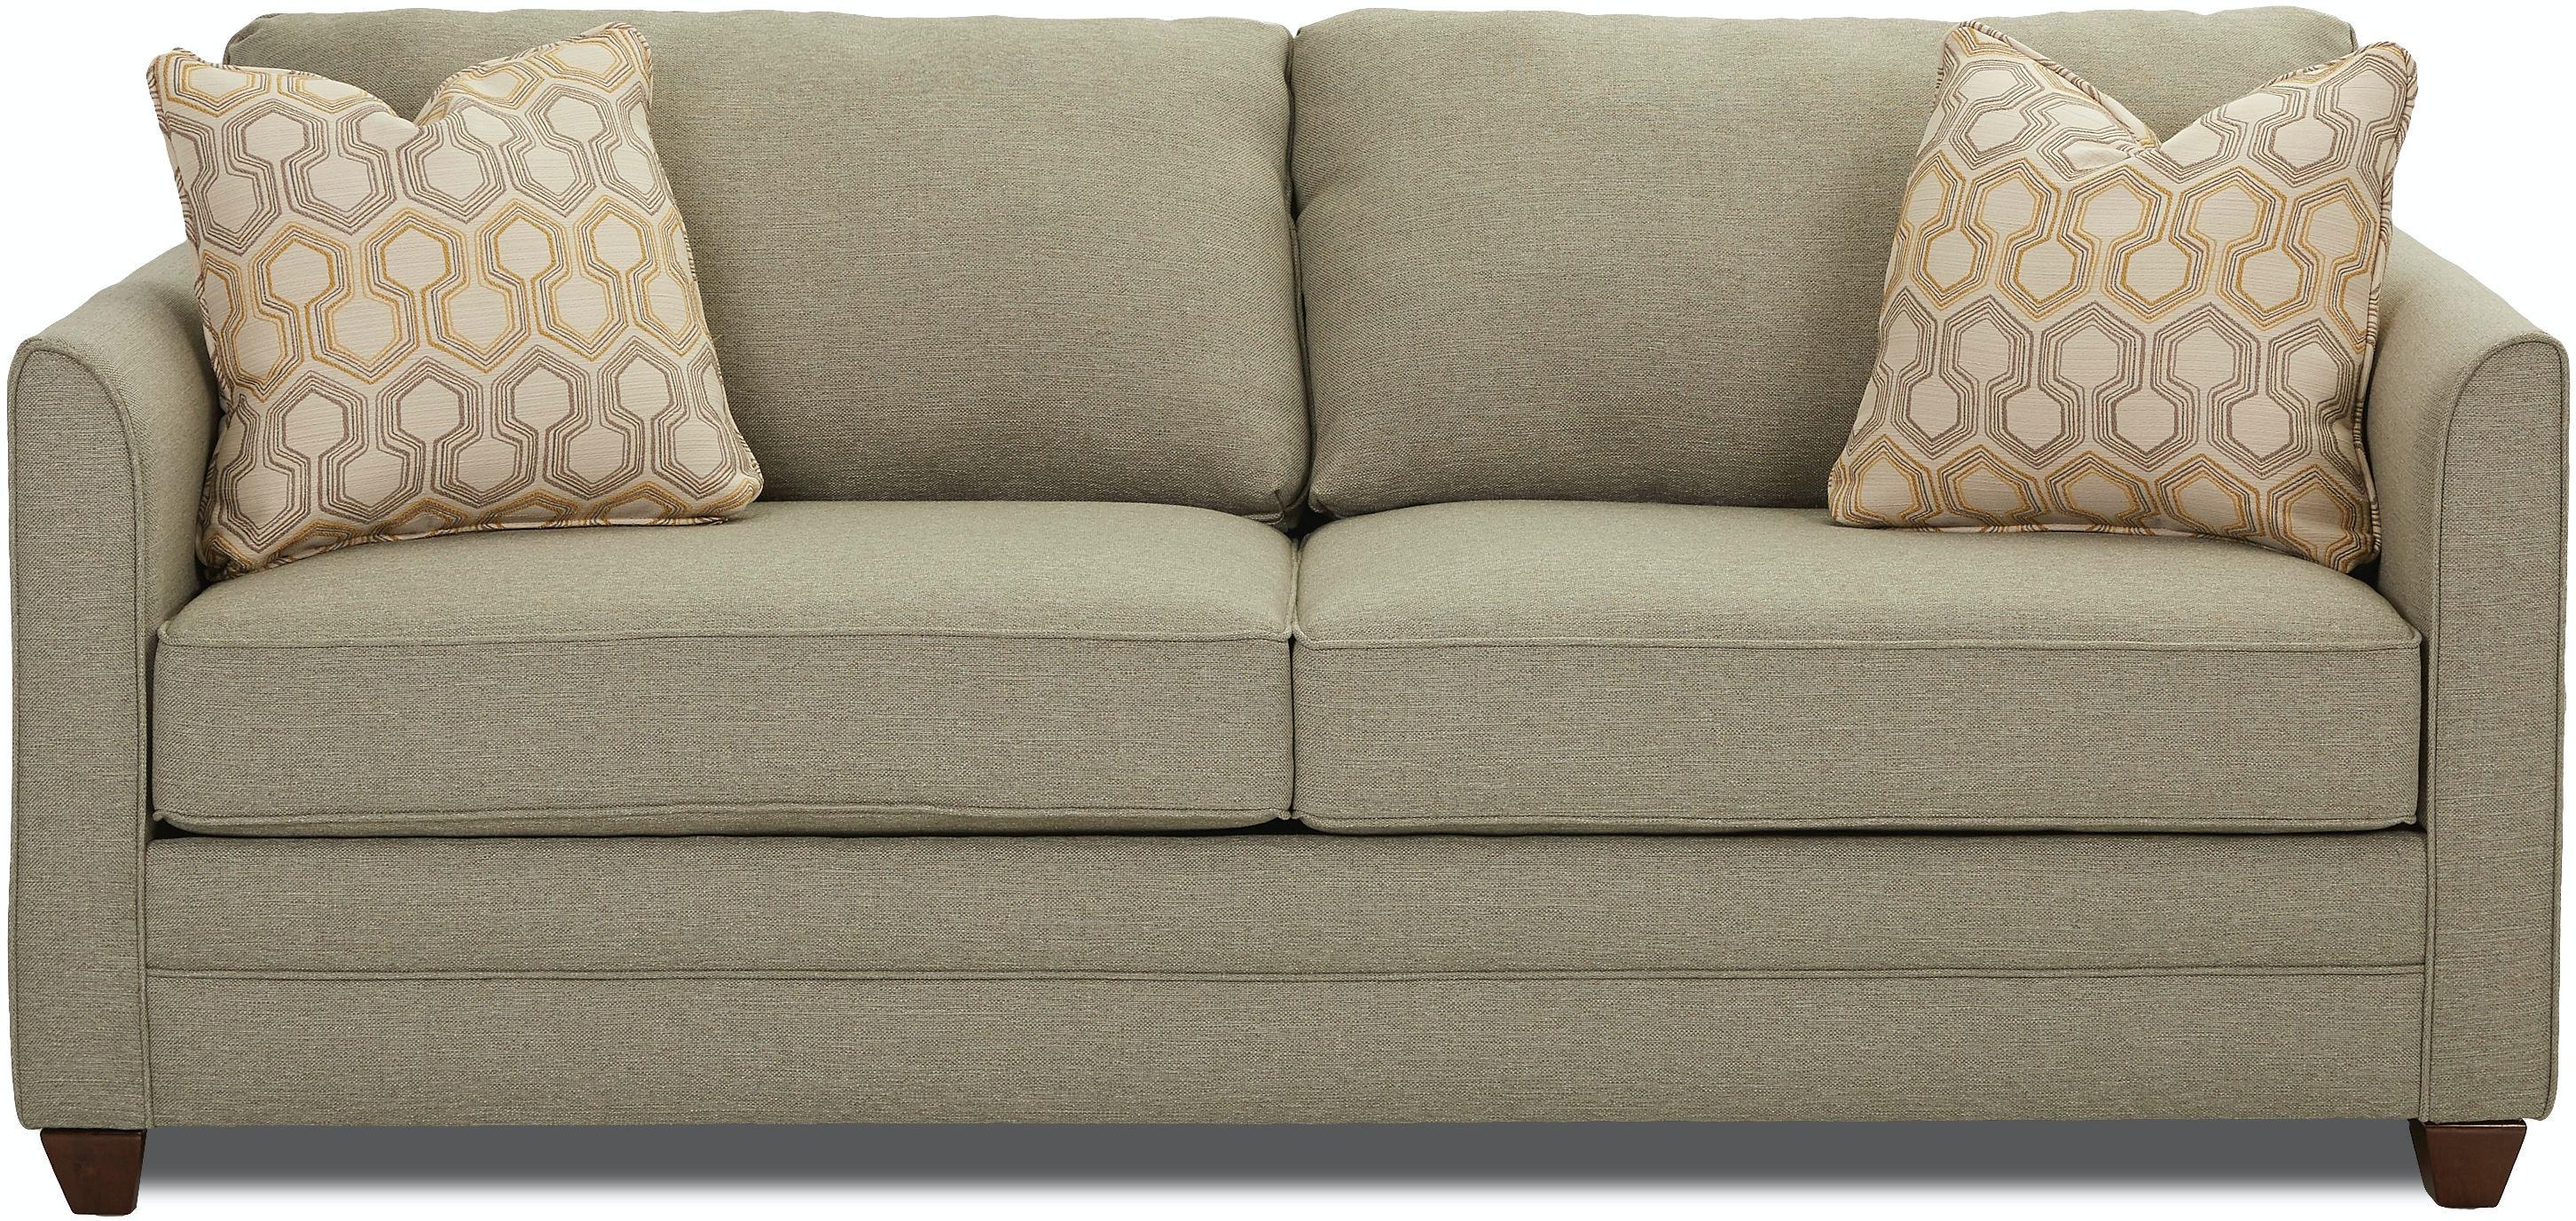 Klaussner Living Room Tilly K S Klaussner Home Furnishings